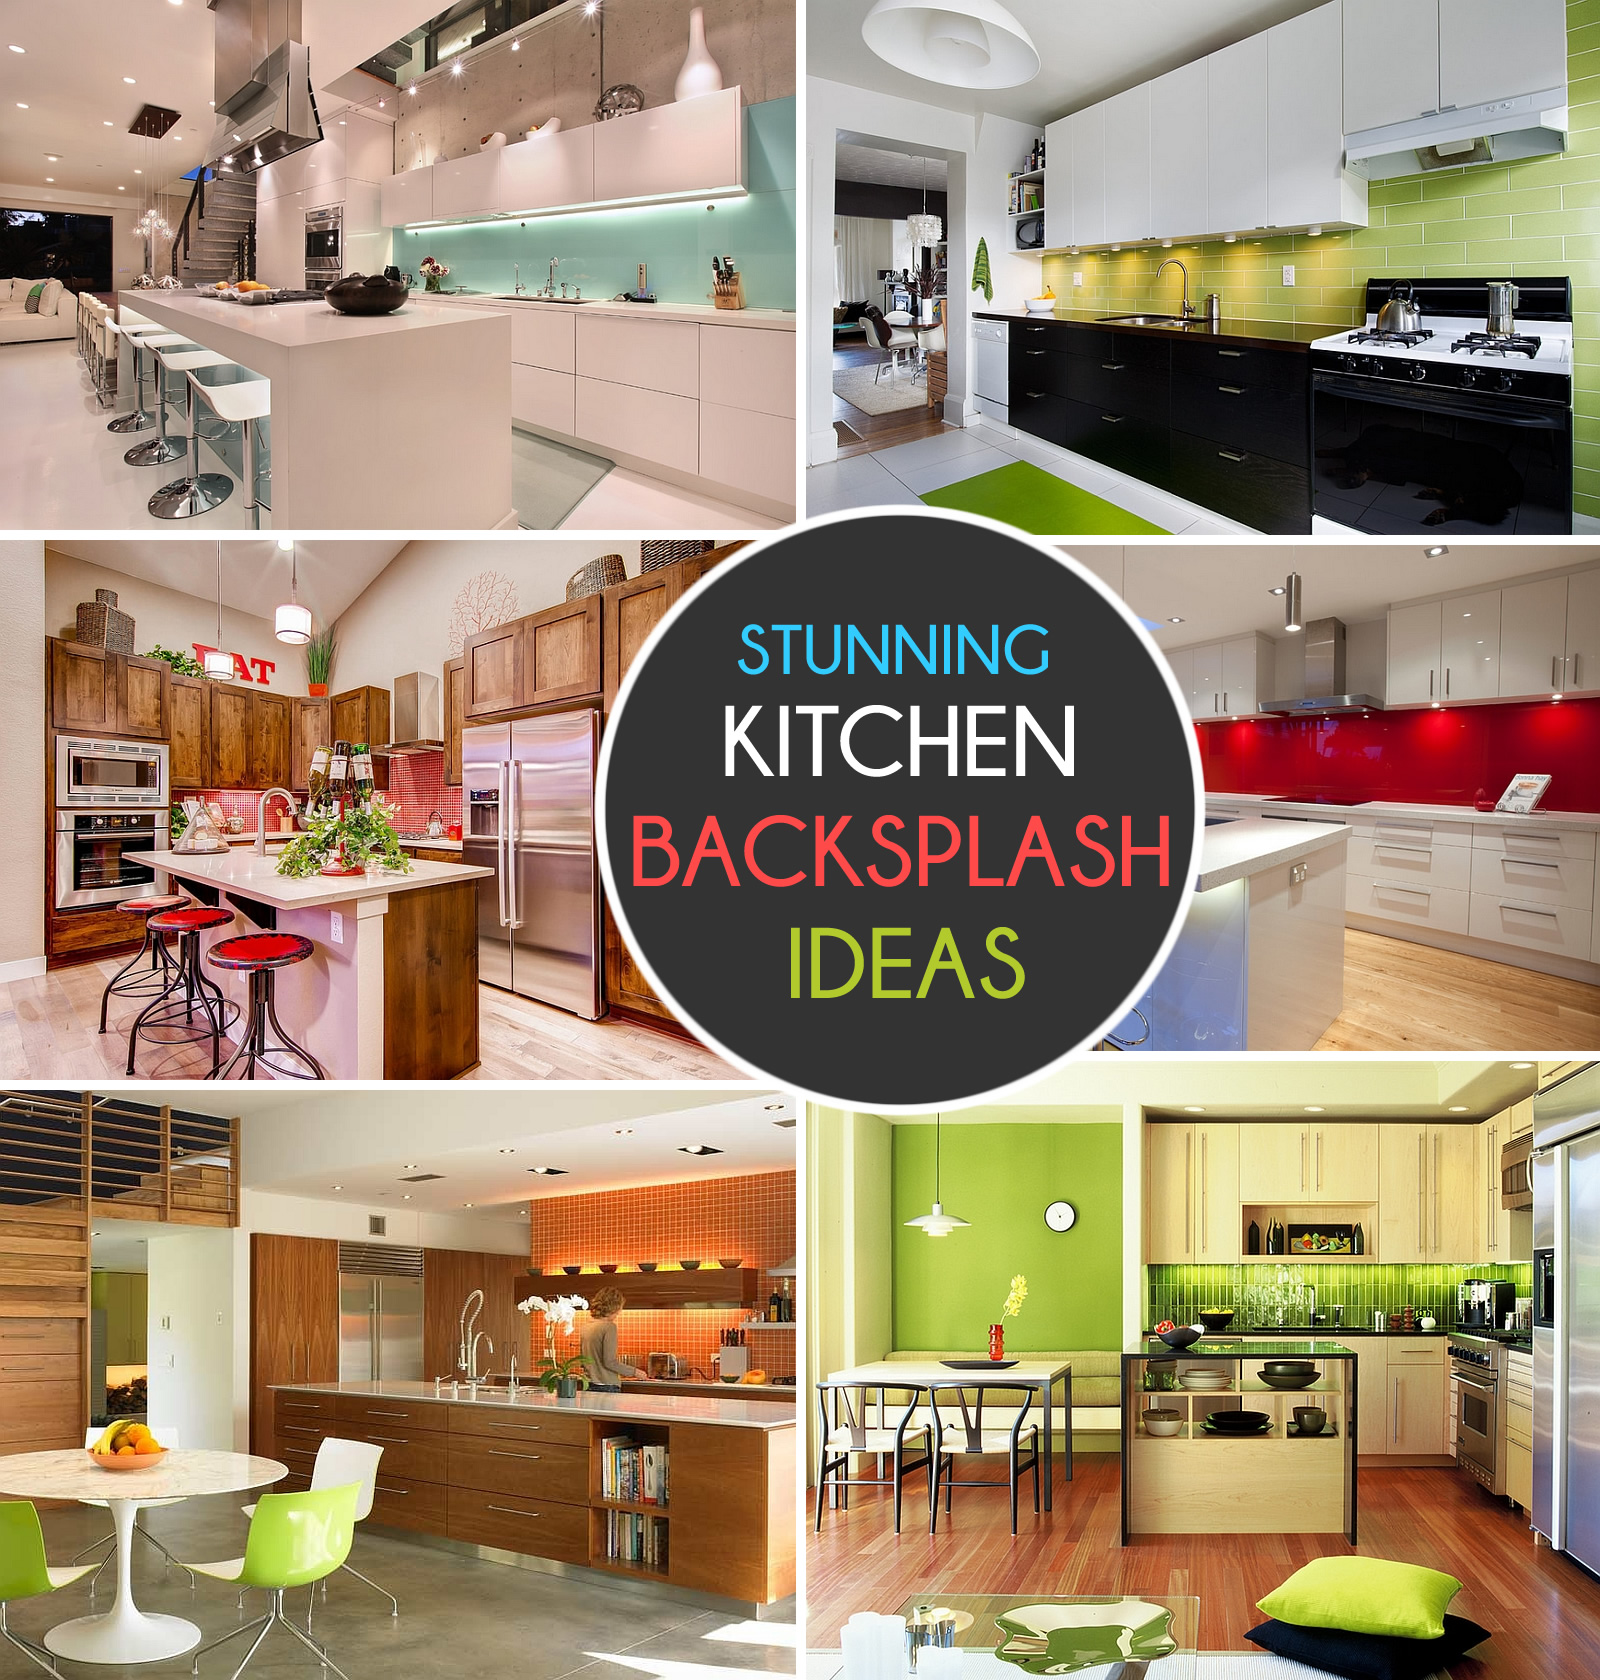 Kitchen Backsplash Ideas A Splattering